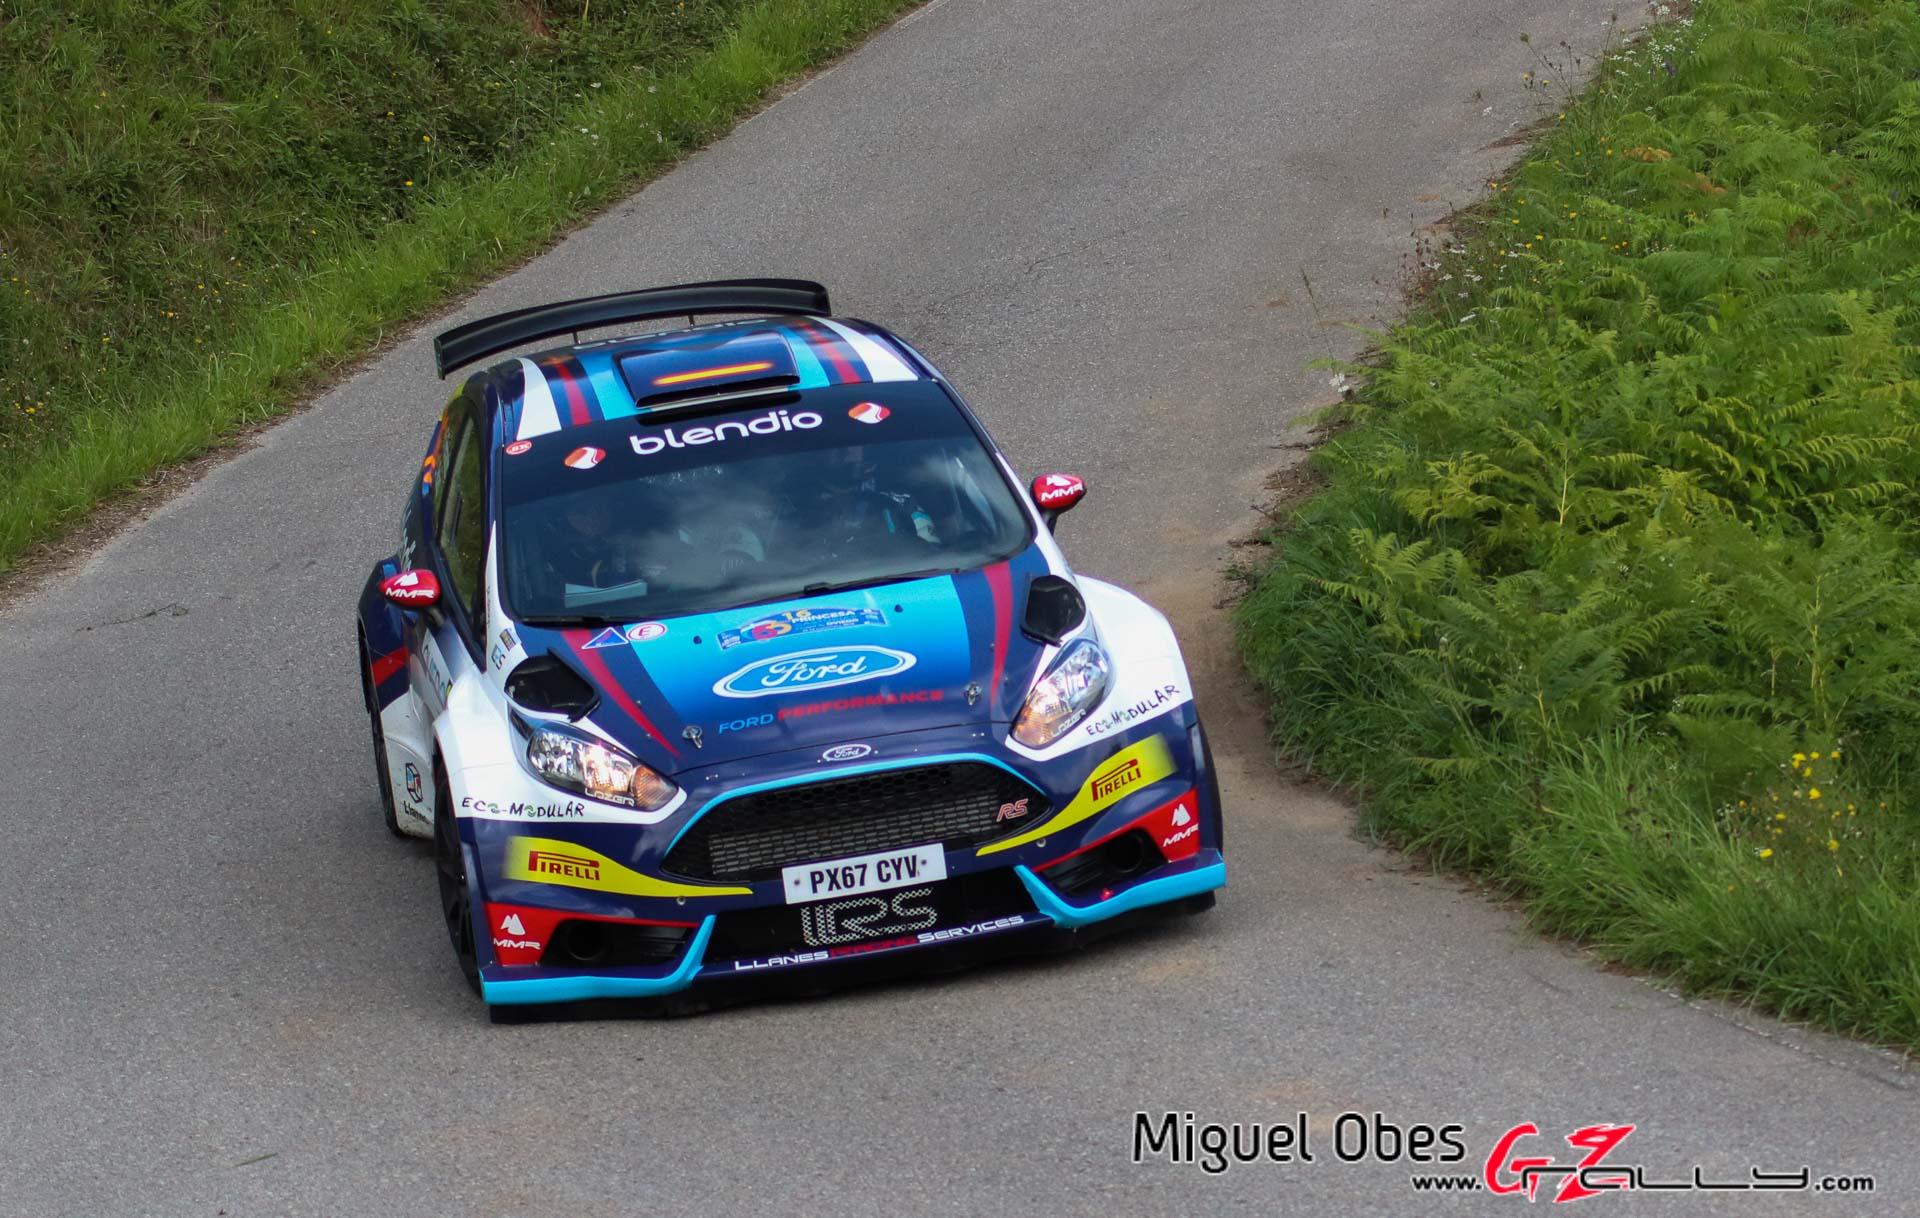 Rally Princesa de Asturias 2019 - Miguel Obes